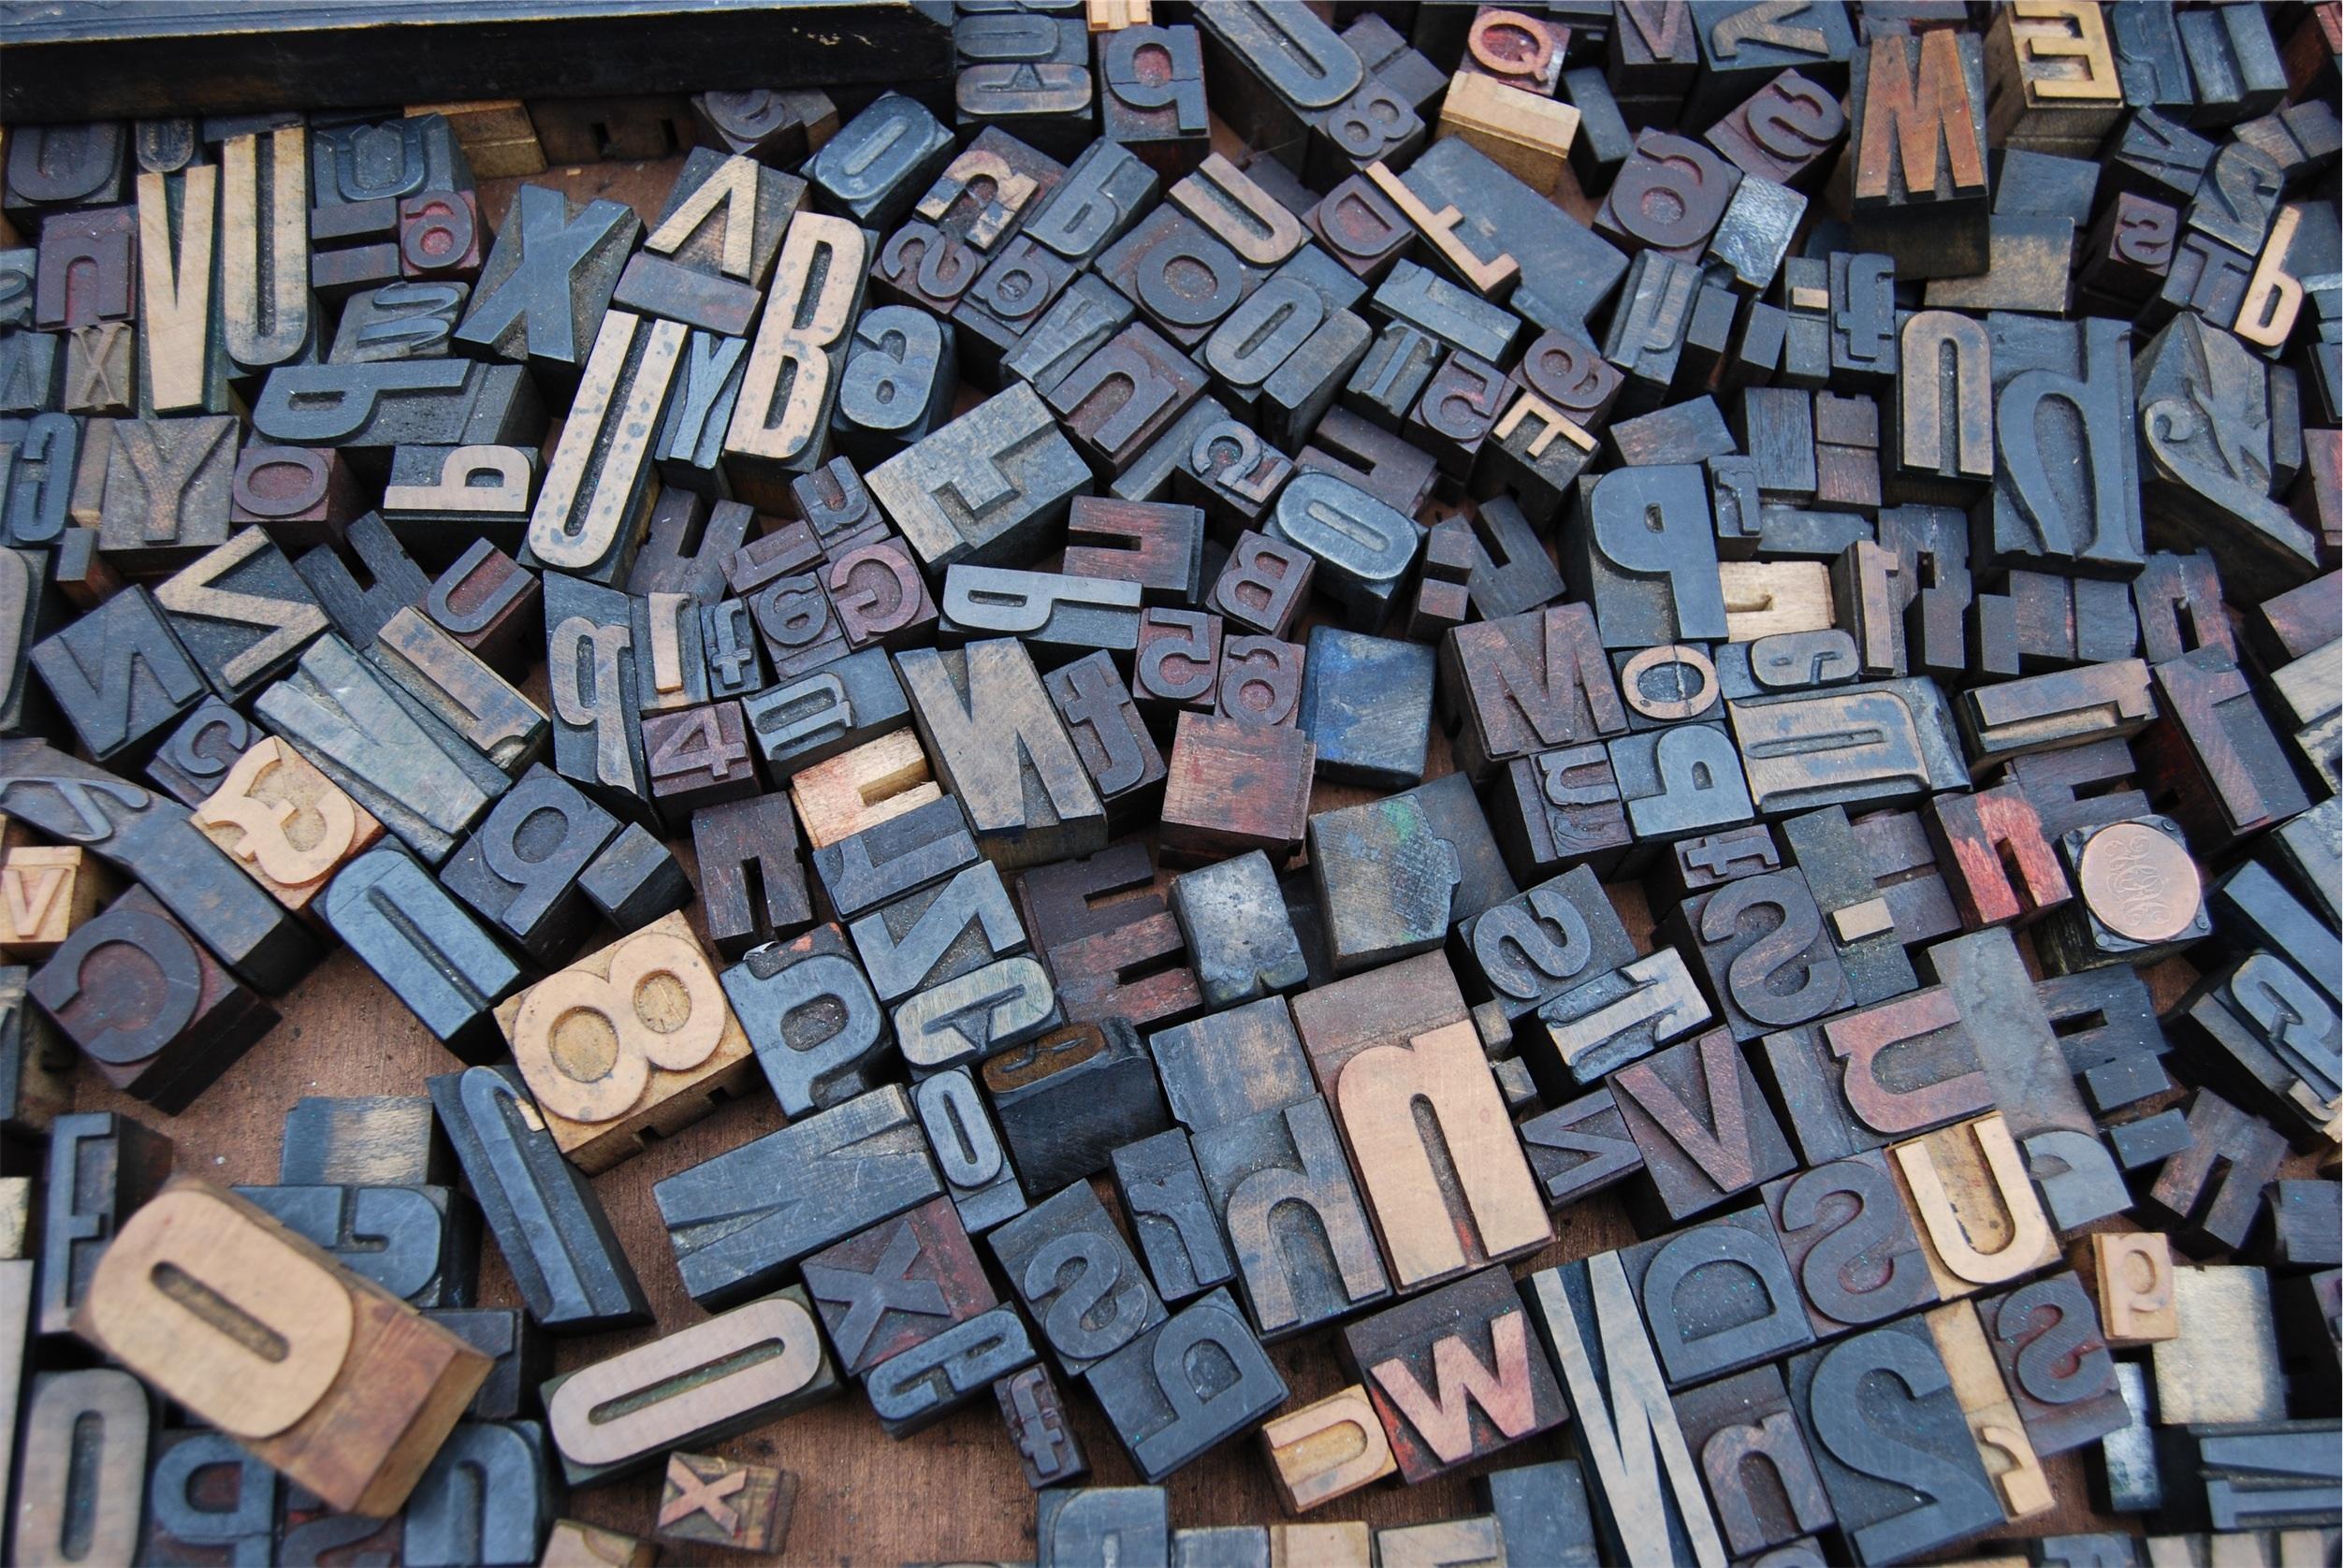 letters, numbers, blocks